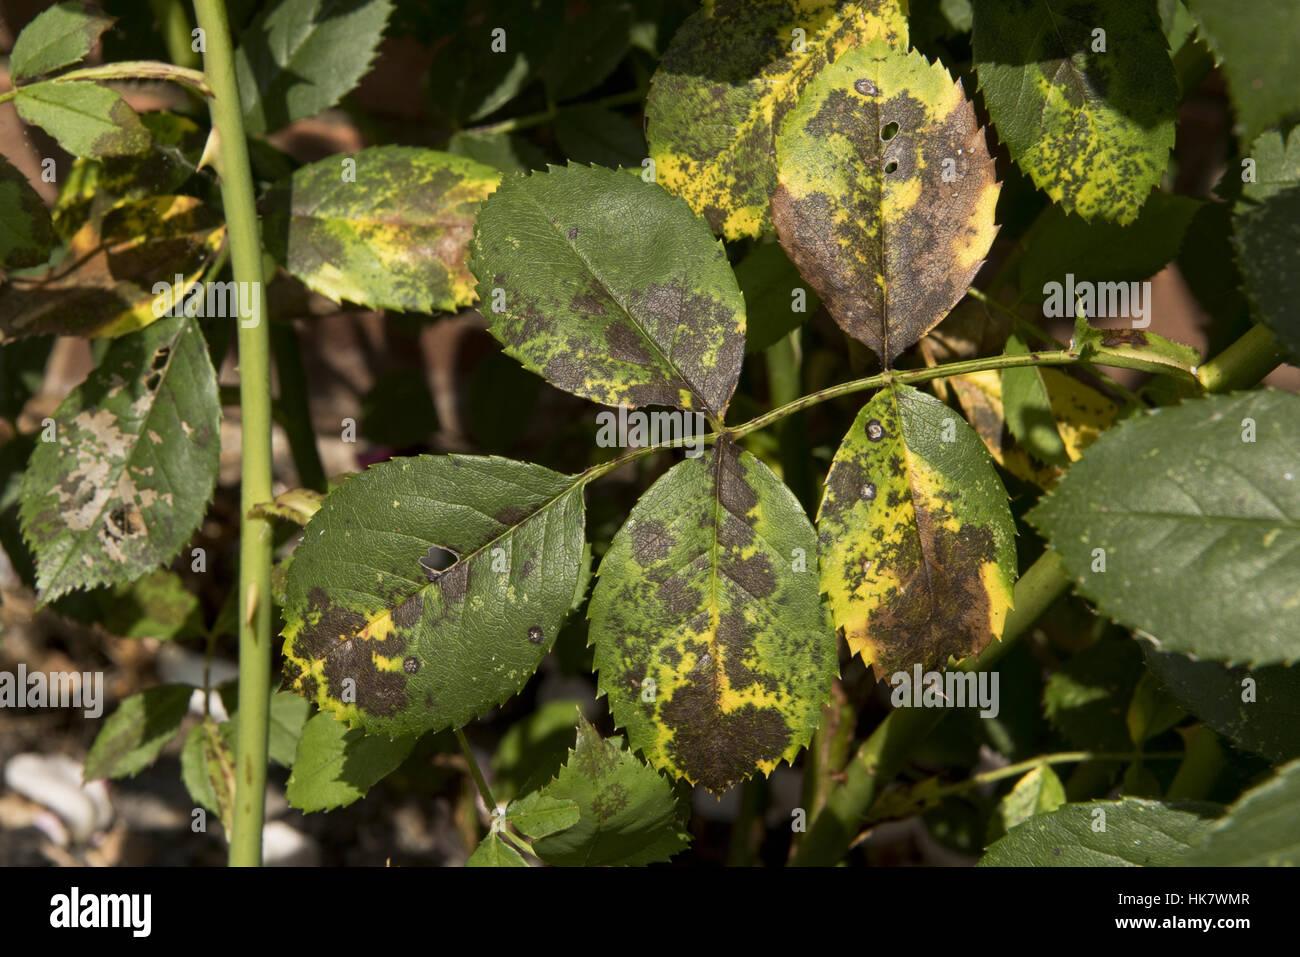 Black spot disease, Diplocarpon rosae, symptoms on a rose leaf, Berkshire, August - Stock Image